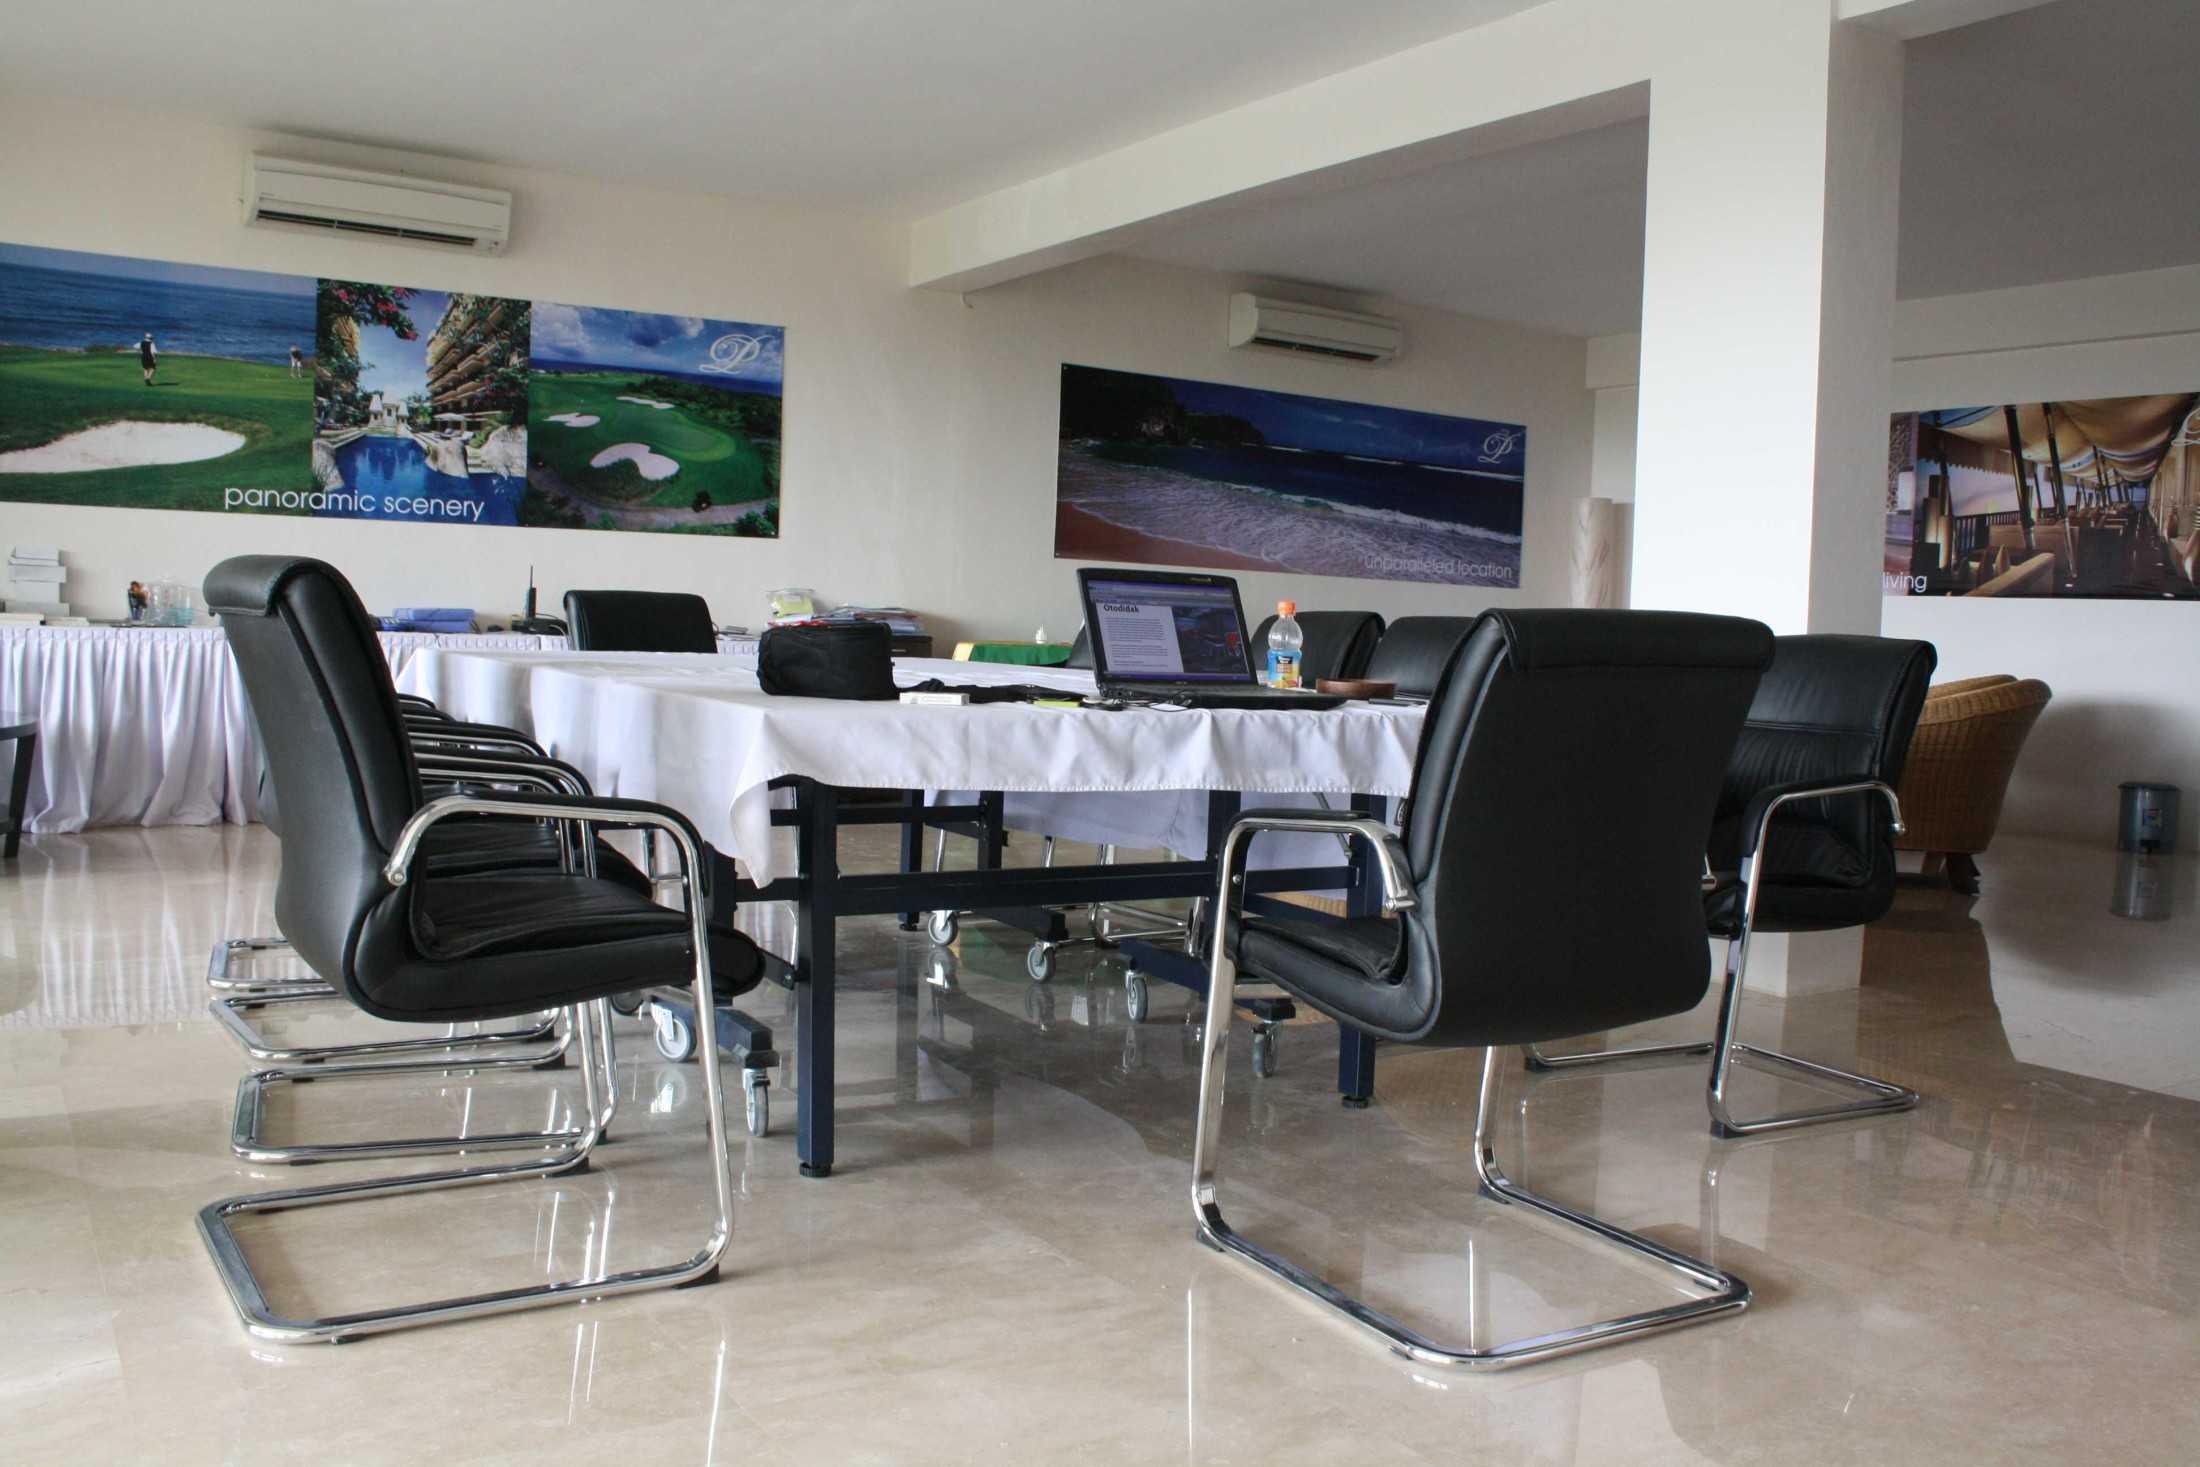 Diro Karya Construction Proyek Hotel The Rich Prada Bali Jl. Pecatu Indah Resort Blok B2, Pecatu, South Kuta, Badung Regency, Bali 80361, Indonesia Jl. Pecatu Indah Resort Blok B2, Pecatu, South Kuta, Badung Regency, Bali 80361, Indonesia Diro-Karya-Construction-Proyek-Hotel-The-Rich-Prada-Bali  72571